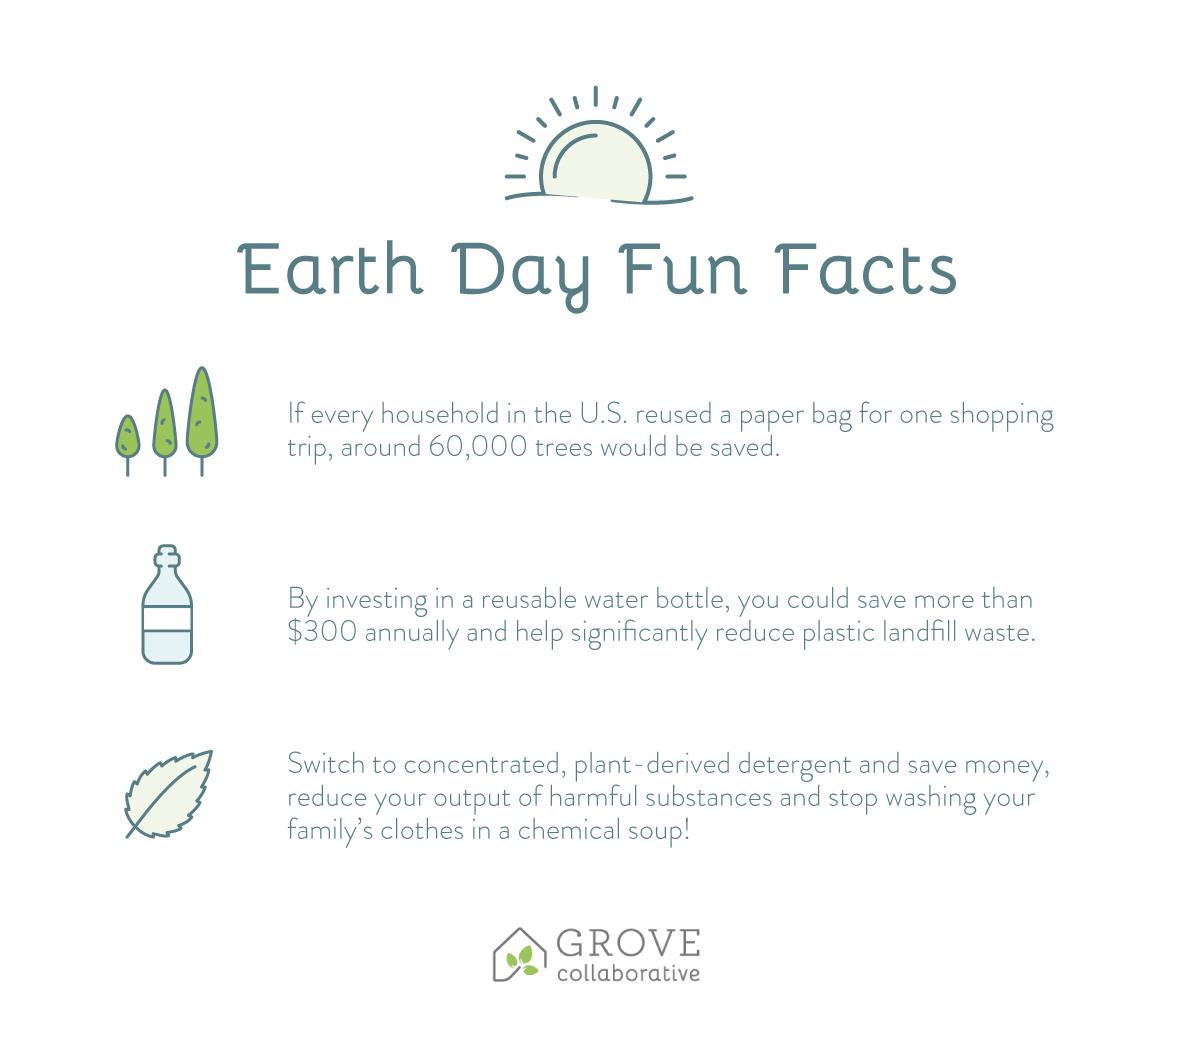 8 Ways to Be More Earth Friendly + Free Mrs. Meyers Everyday Luxuries Set at JoyfullySmitten.com